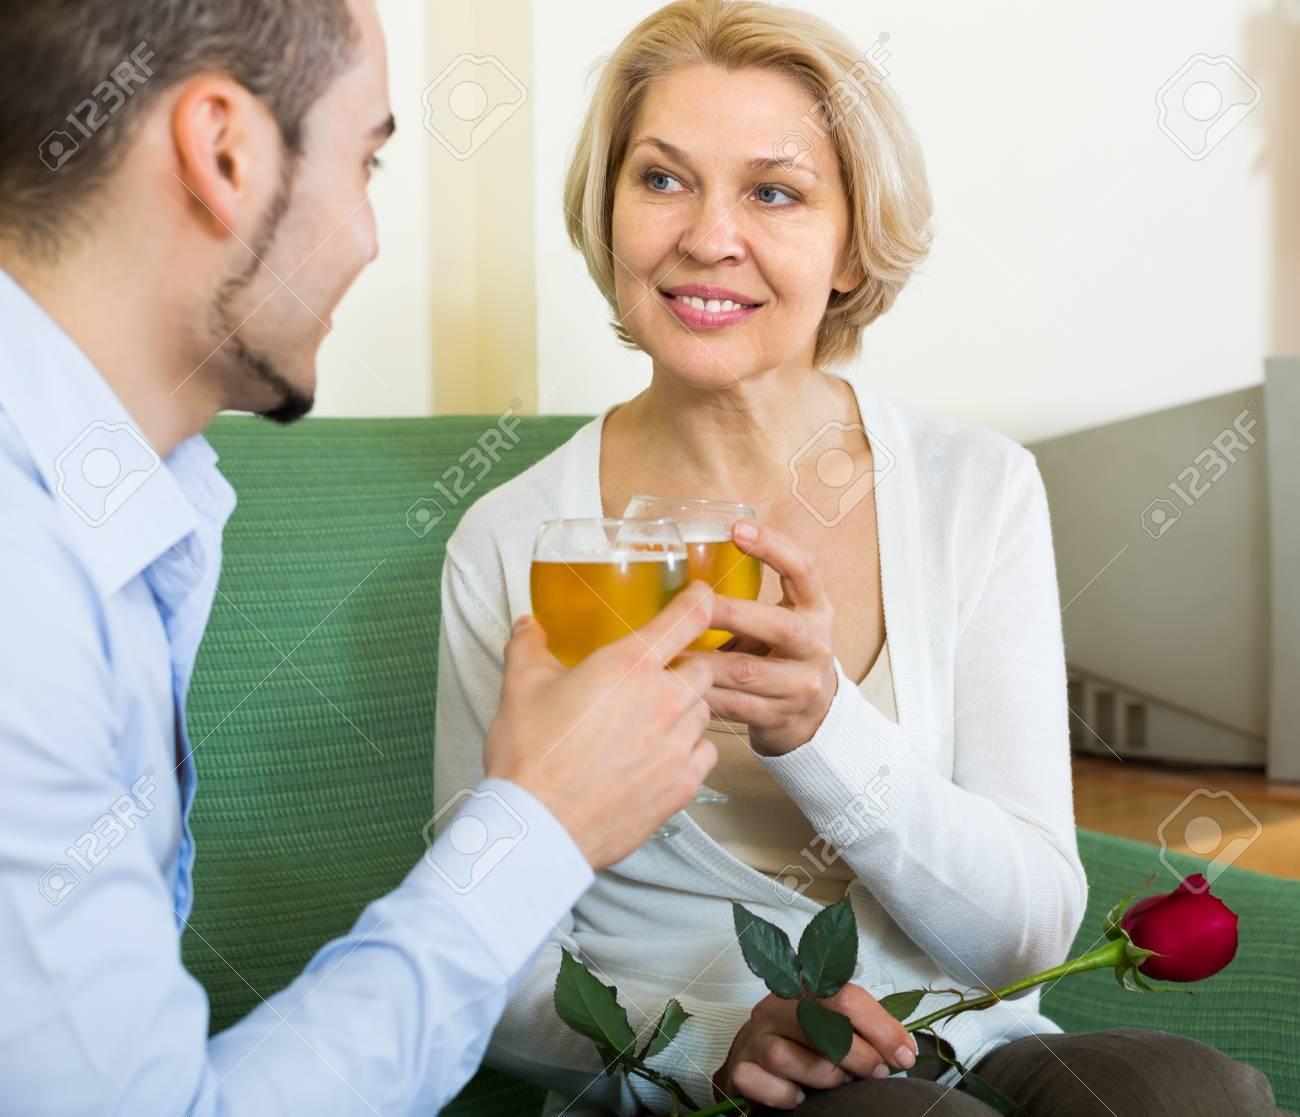 Ältere Frauen aus jüngeren Männchen